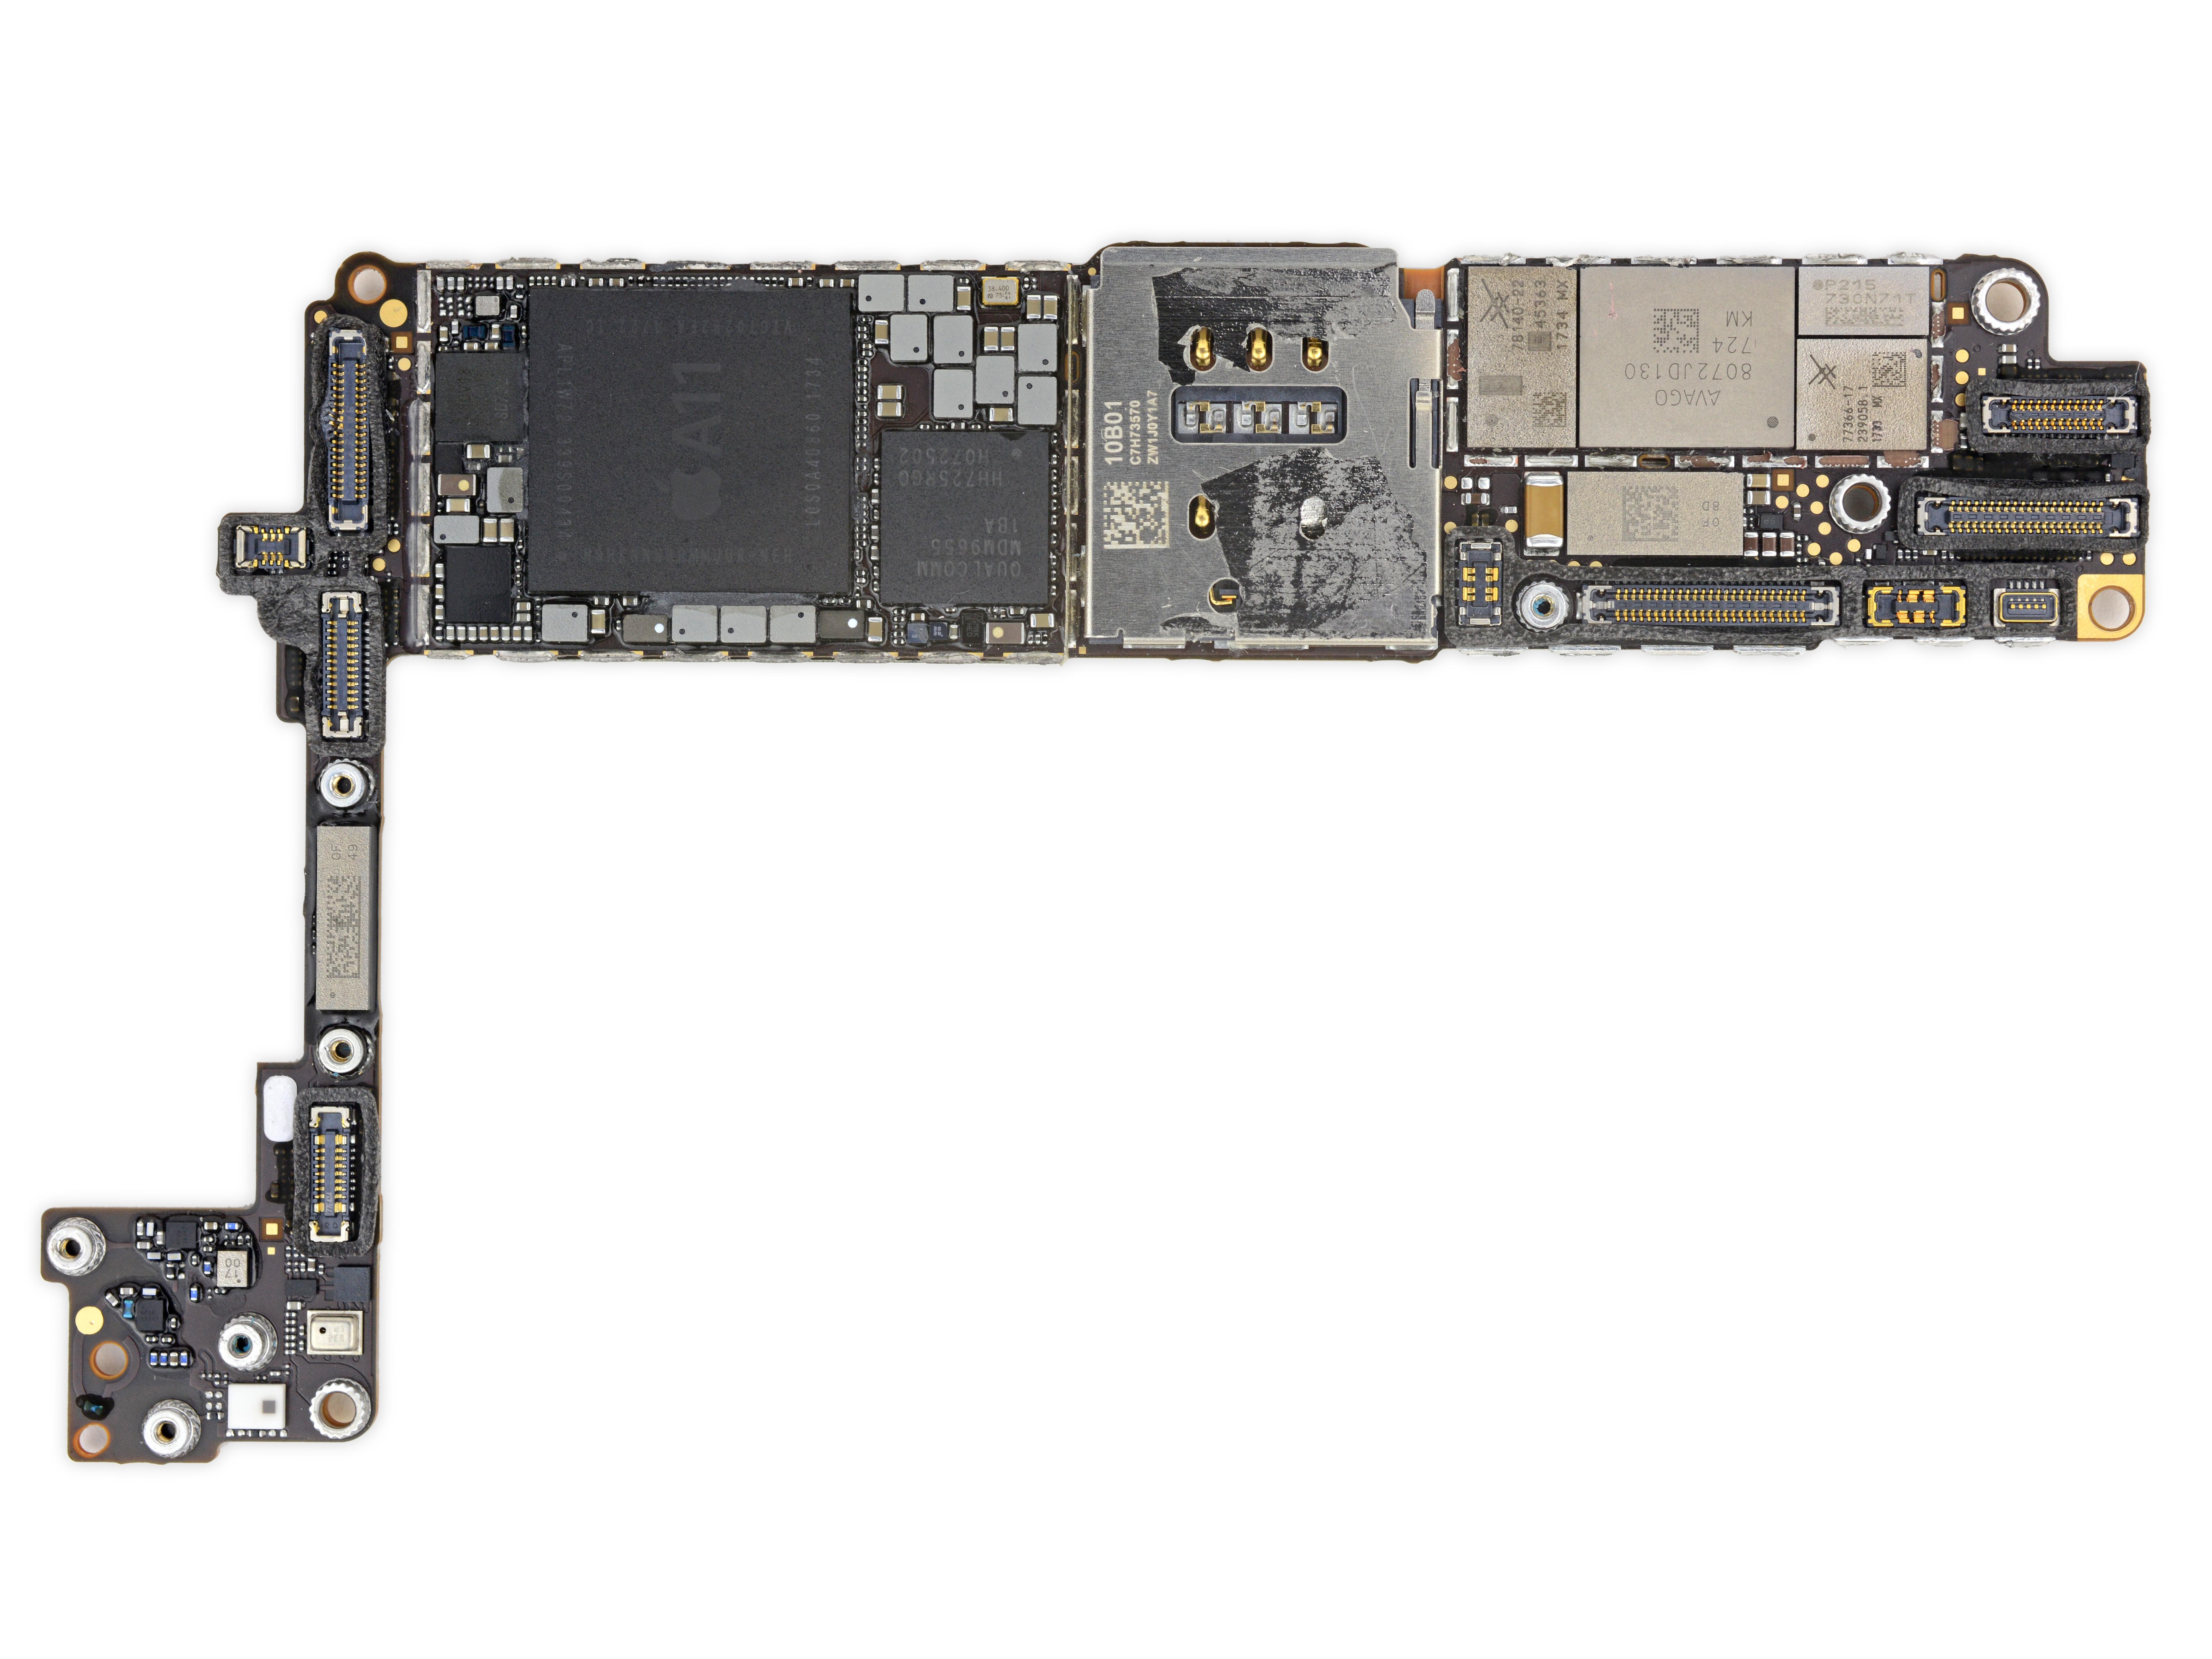 Placa base del iPhone 8